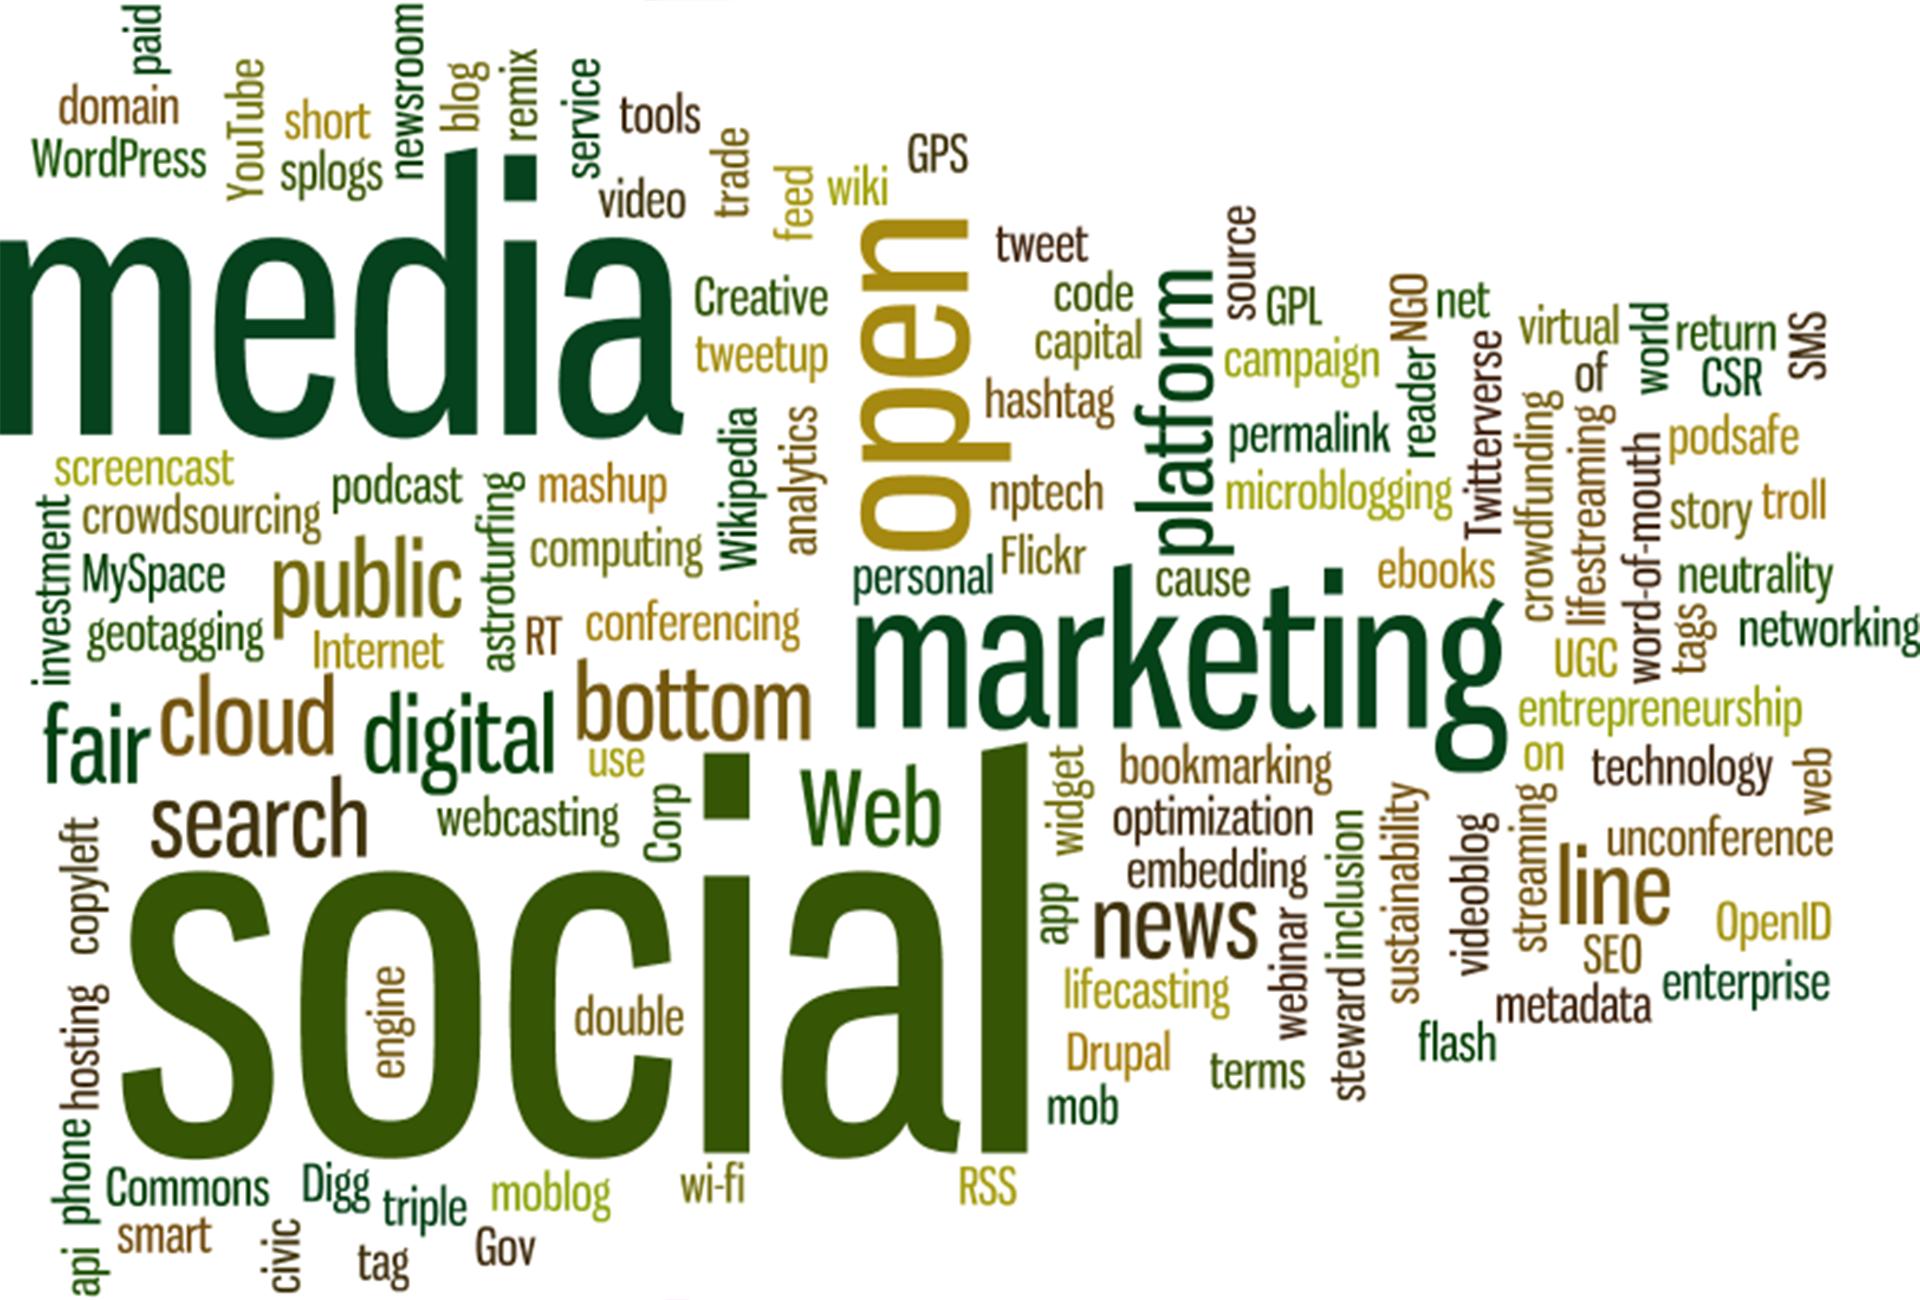 HappyWeb.ro | Services | Online marketing | Web design, web development, online marketing